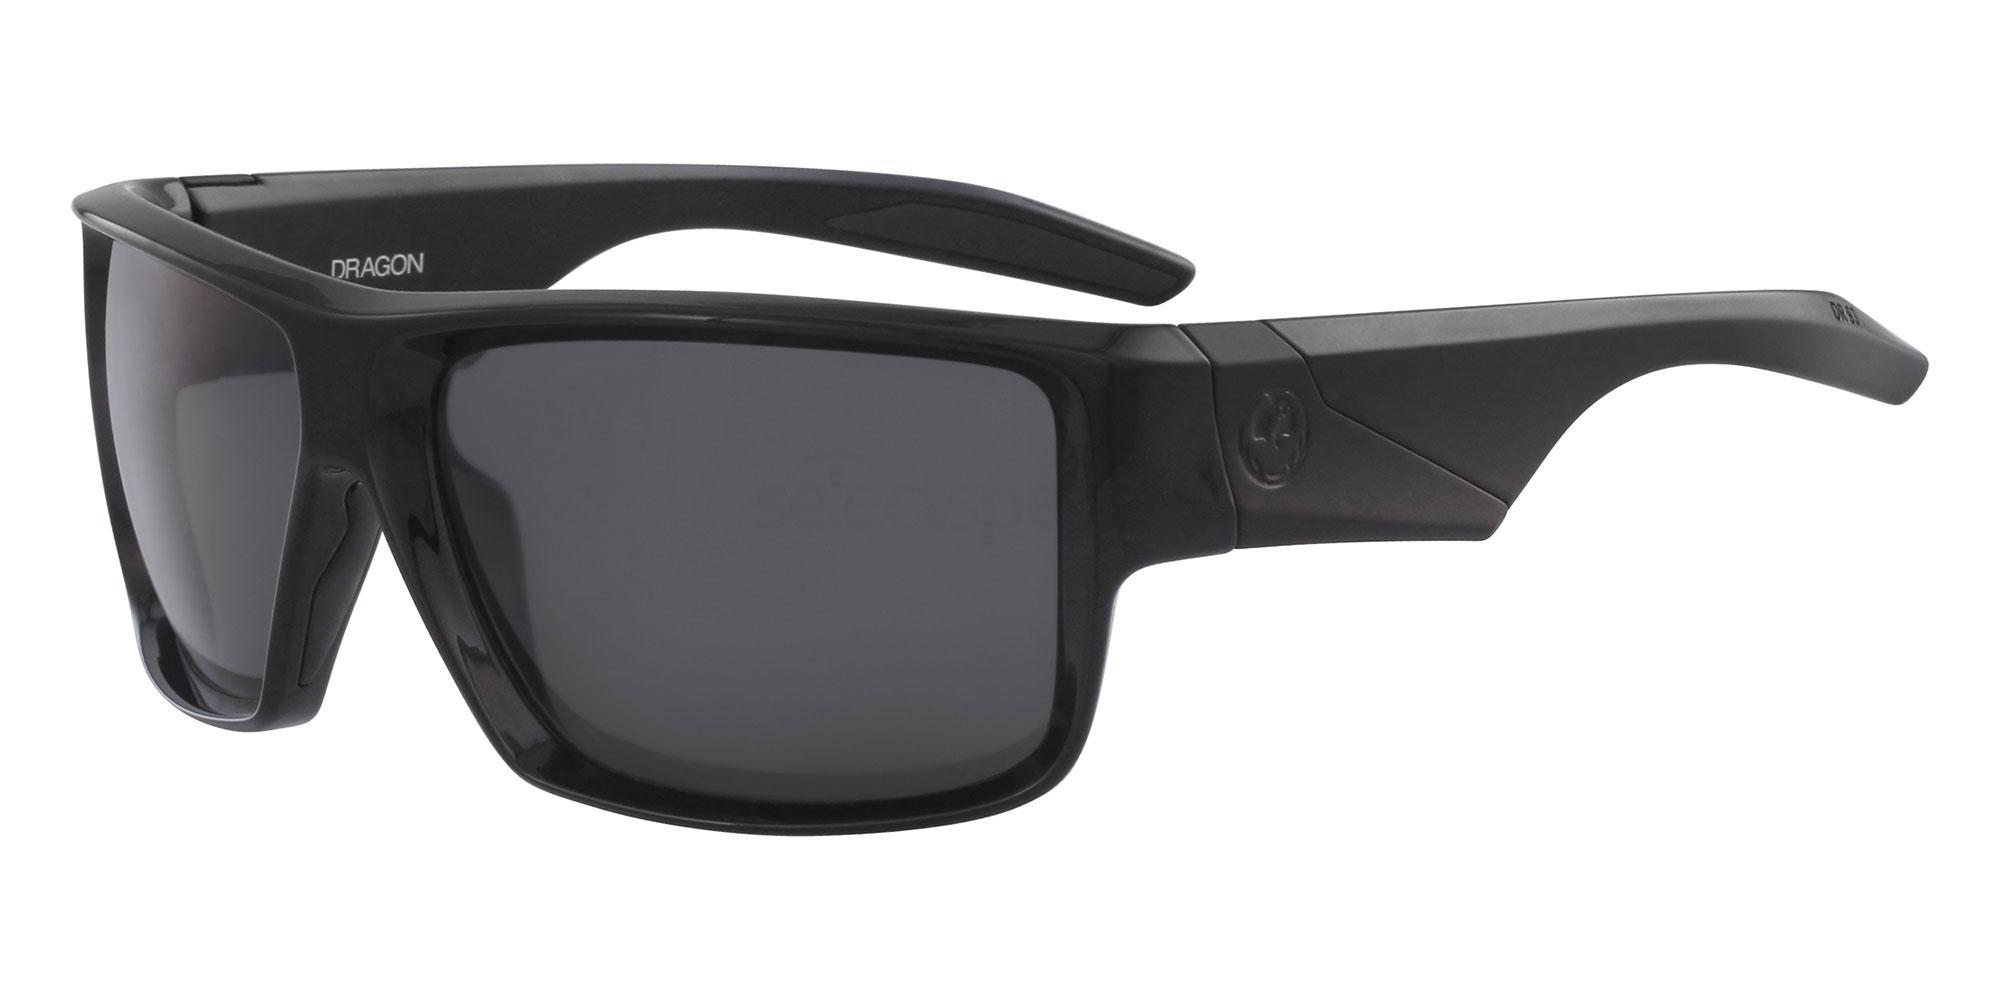 001 DR DEADLOCK POLAR Sunglasses, Dragon